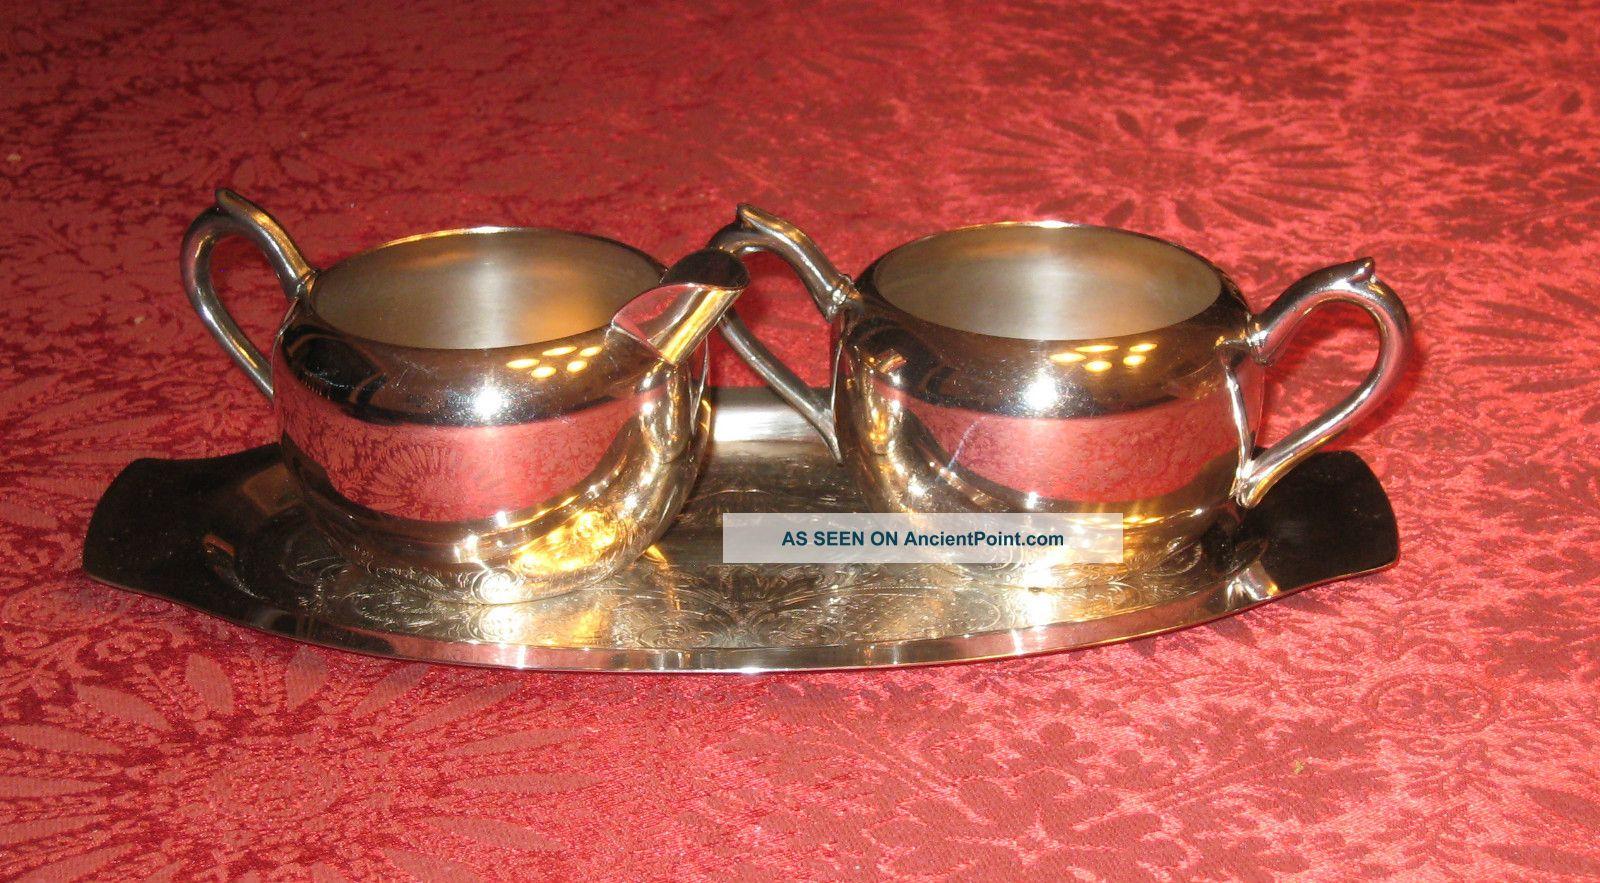 F.  B.  Rodgers Silver Co 3 Pc Tea Set,  Creamer - Sugar - Tray 1087 Silverplate - Exc Creamers & Sugar Bowls photo